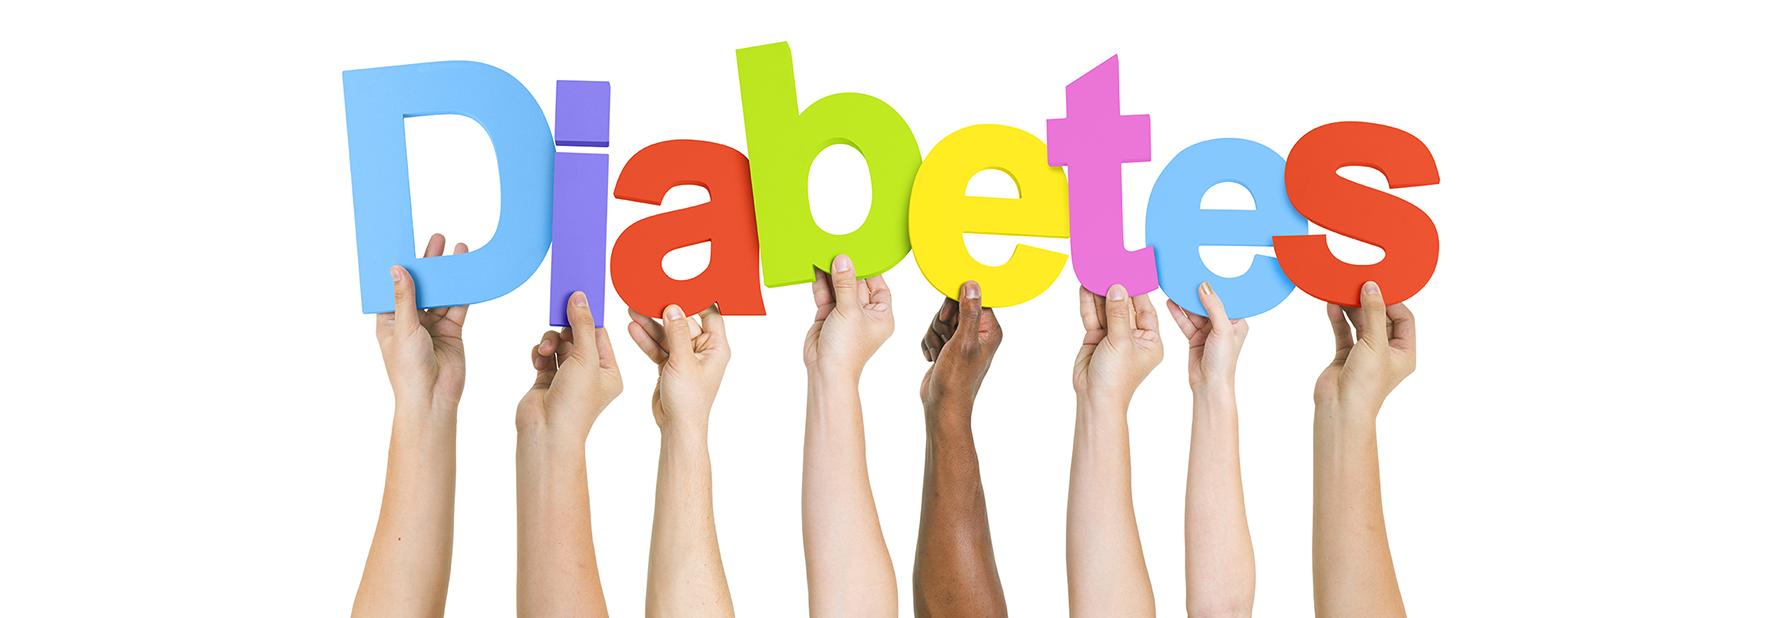 GoDARTS-Homepage-Diabetes image